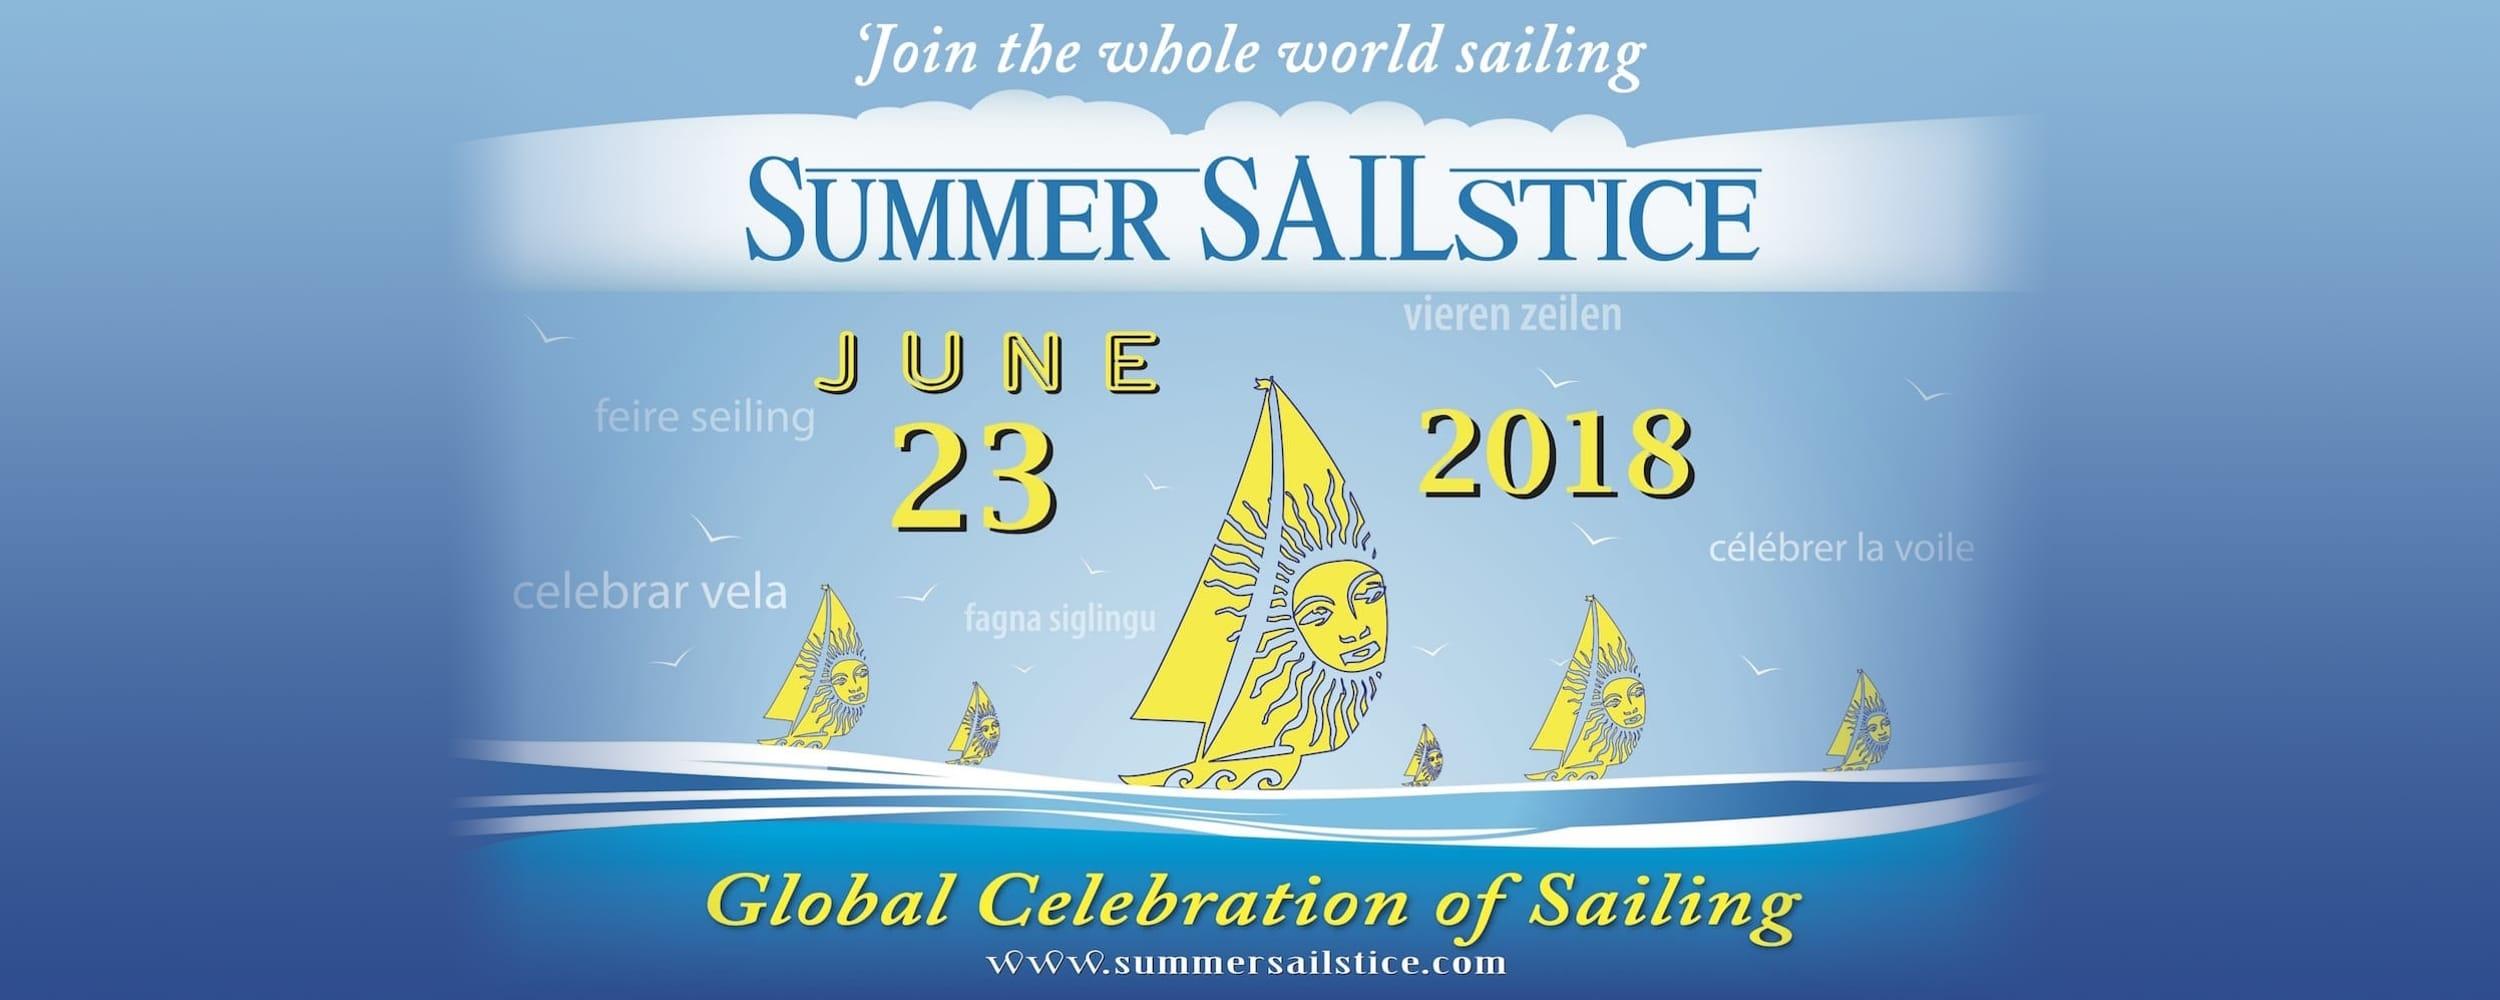 Summer Sailstice 2018